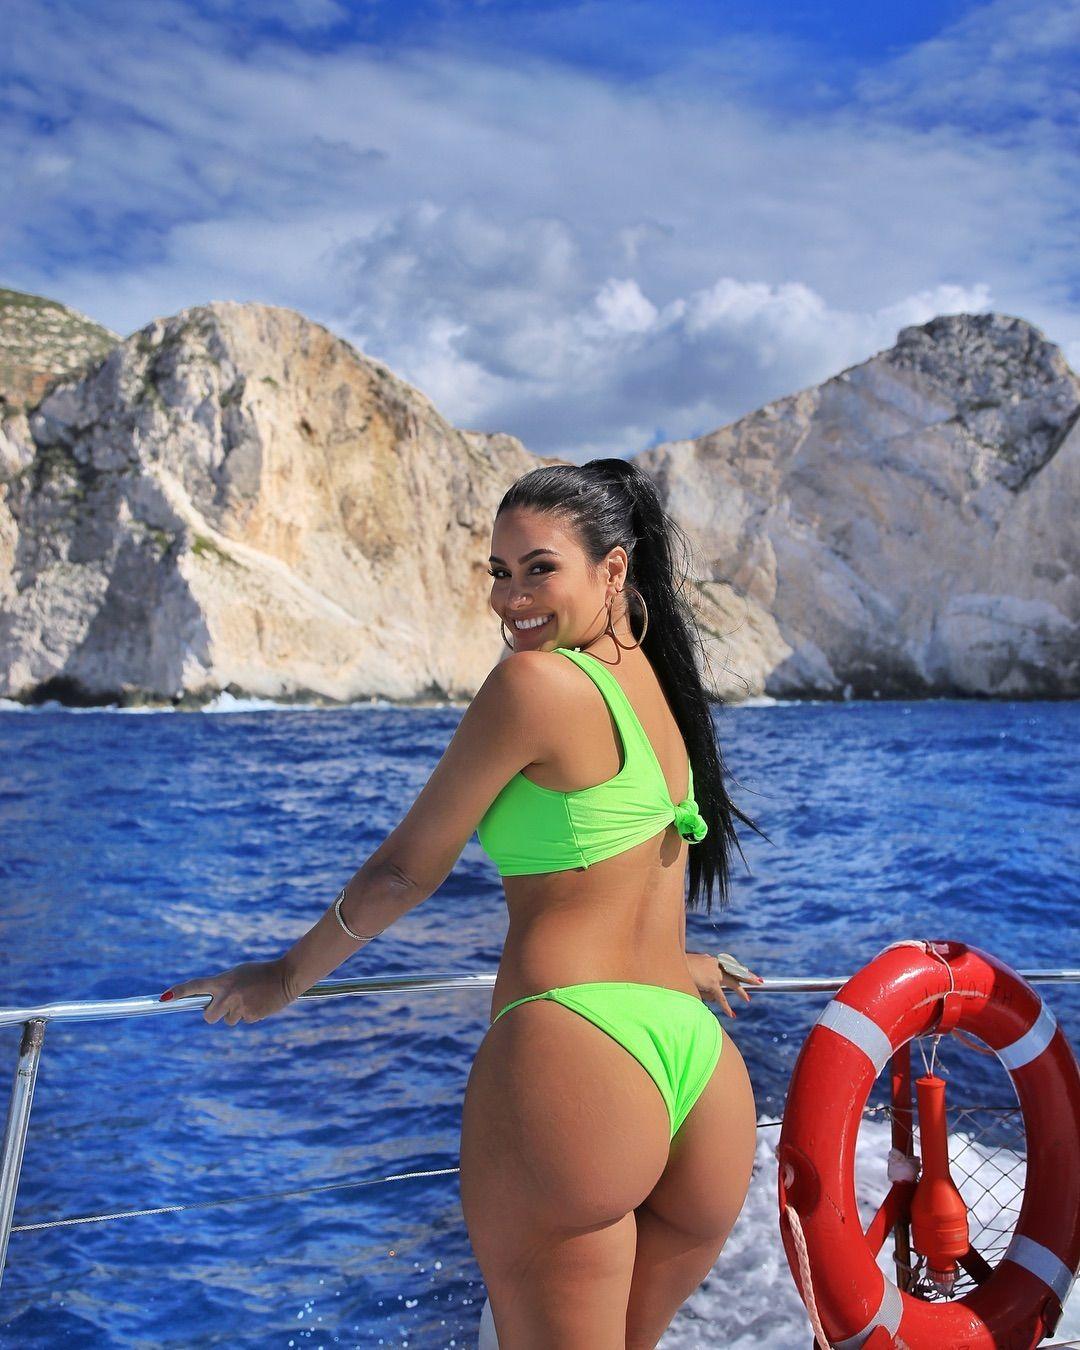 Mimi Pabon On Instagram Memorias De Las Playas De Zakynthos Grecia Este Lugar Es Hermoso Sin Duda Mi Isla Favorita De Bikinis Pretty Woman Swimwear Mimi pabon the most beautiful woman on the world #mimipabon #puertorican #goddess #celebrity #fitness #makeup #travel #fashion #workout #tvpresenter #tvhost #actress #beach #reporter #model #beautypageant #diosa #hermosa #misspuertorico #missinternational #nuestrabellezalatina. mimi pabon on instagram memorias de